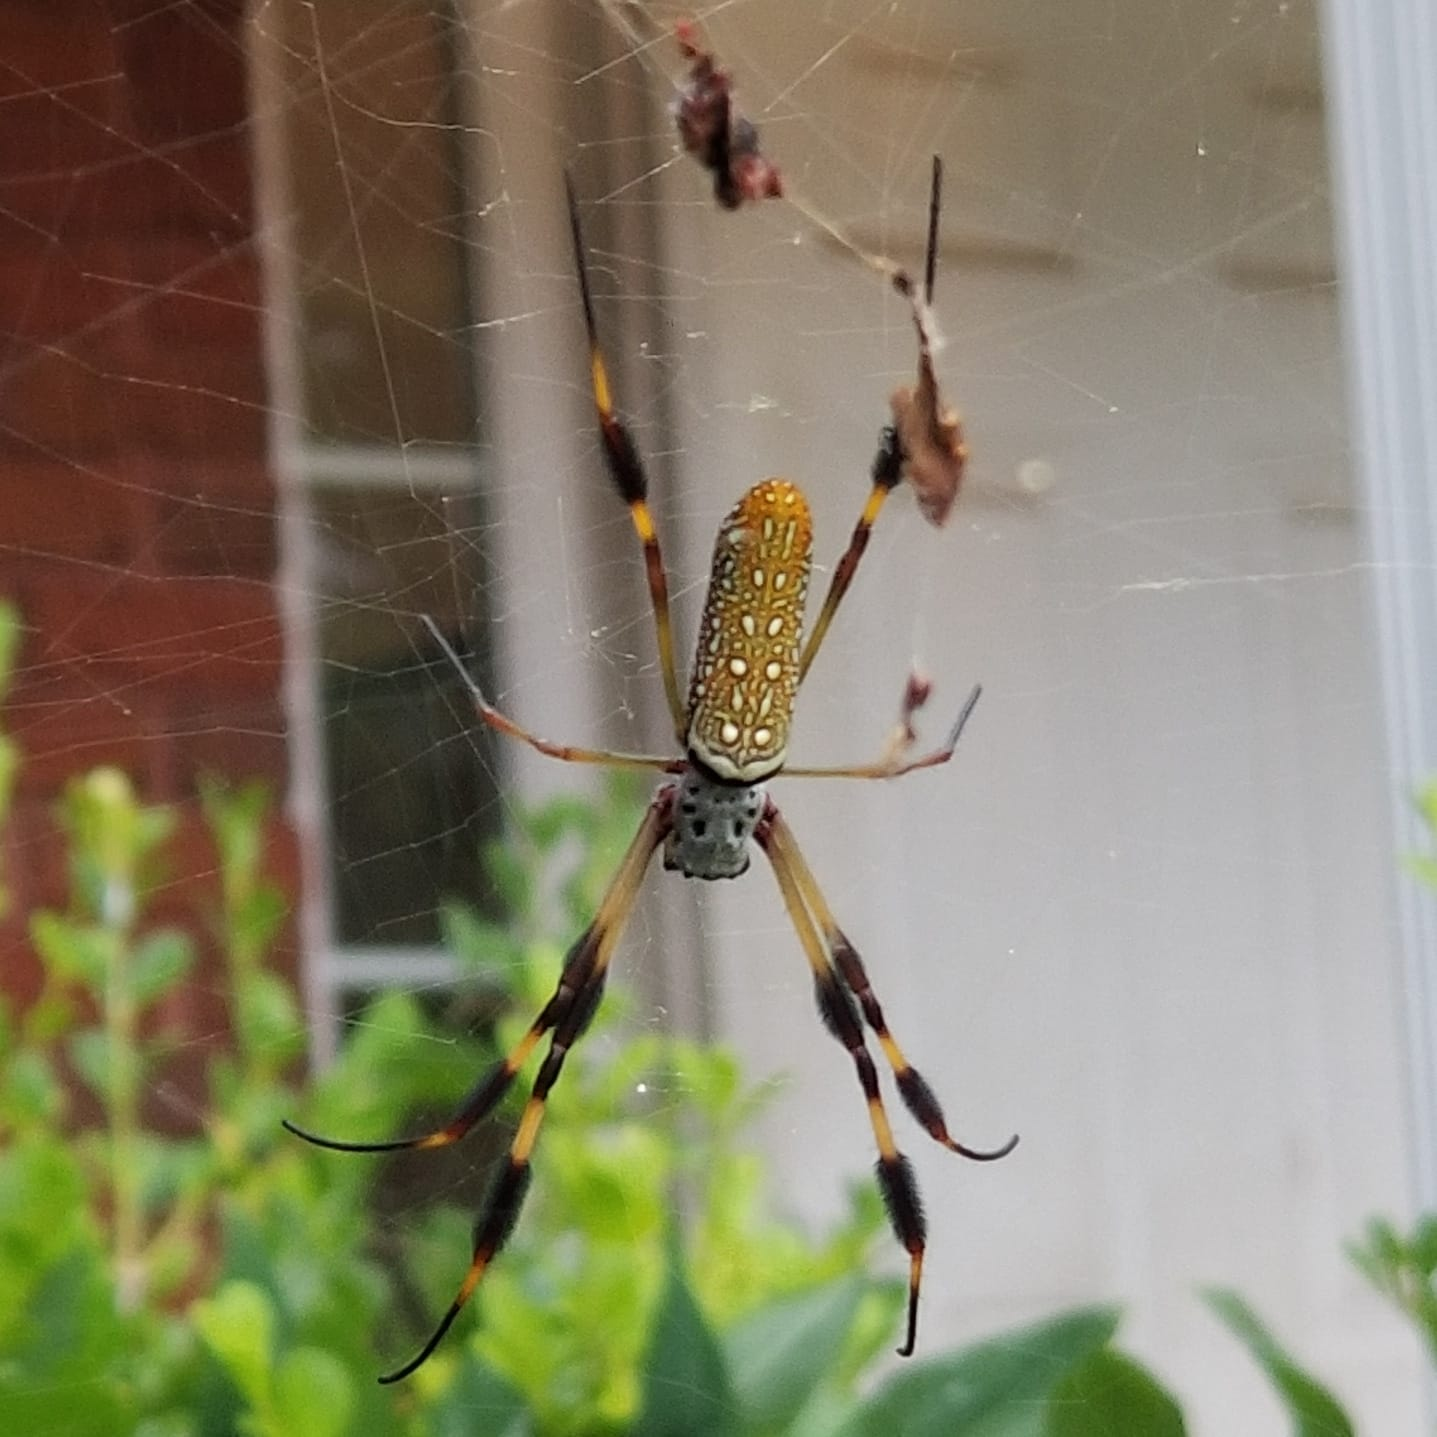 Picture of Trichonephila clavipes (Golden Silk Orb-weaver) - Dorsal,Webs